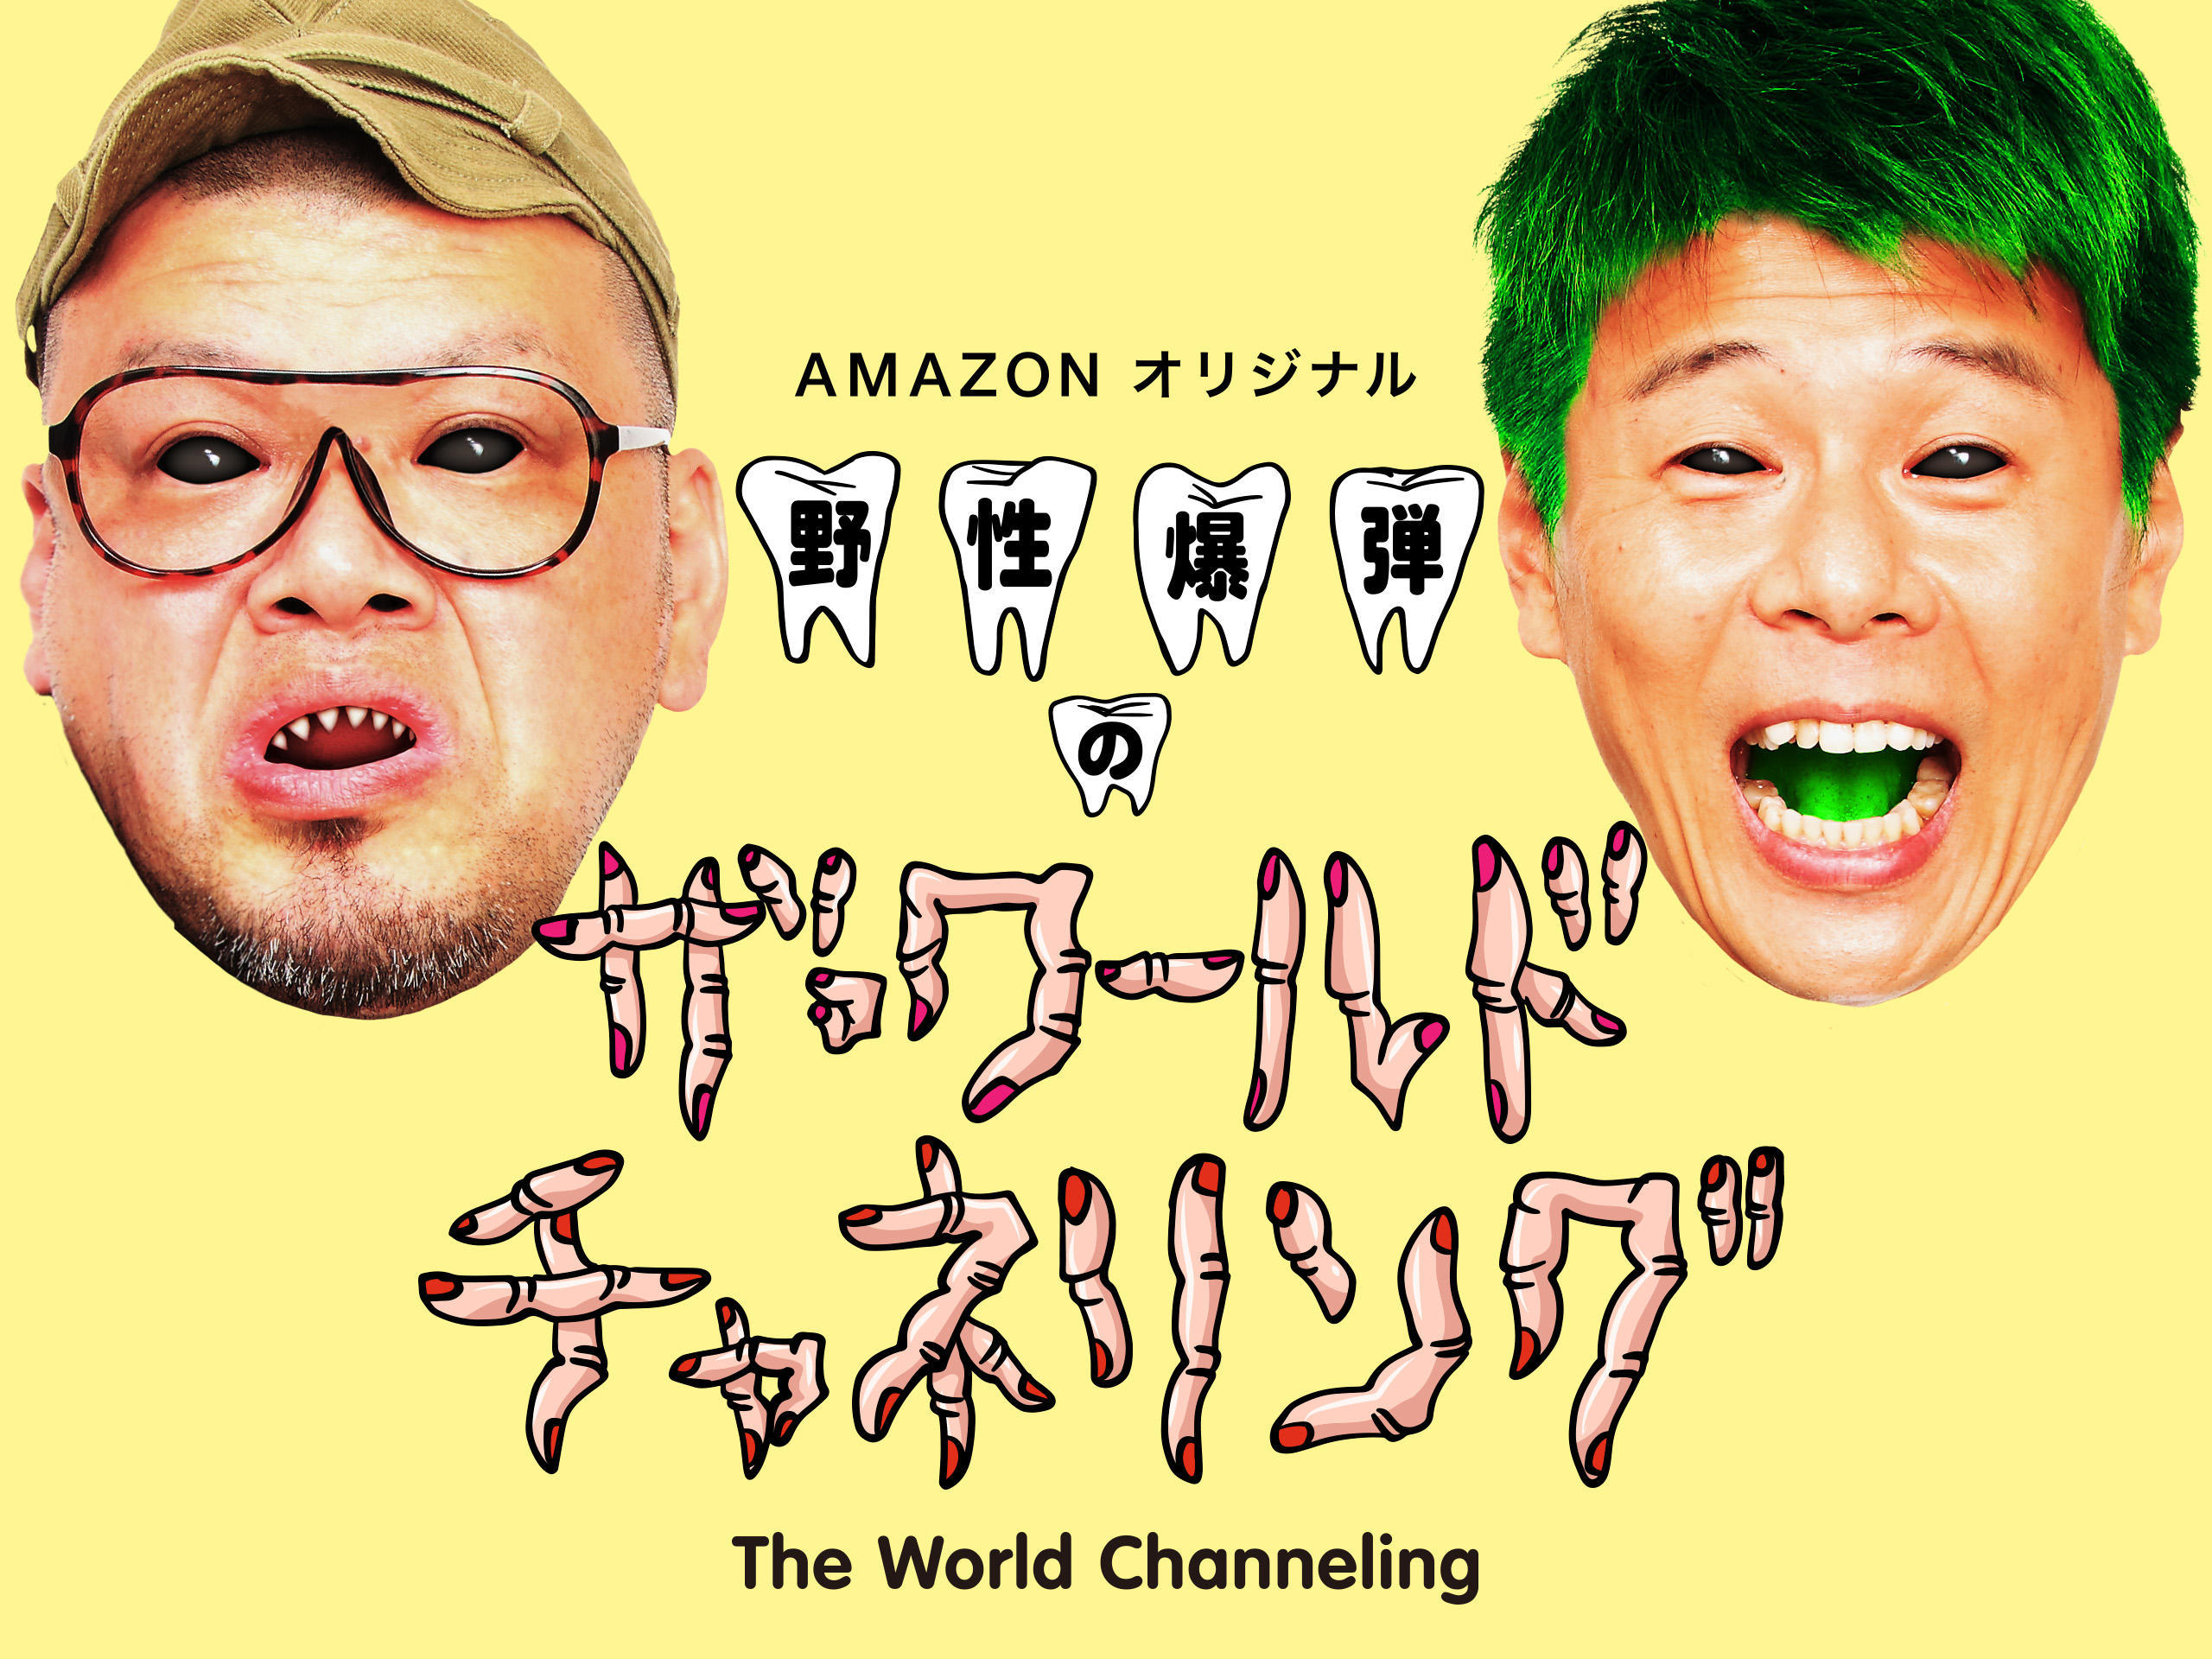 http://news.yoshimoto.co.jp/20170705193307-836eb21f944deceff45f82adda897cf41bb94ec7.jpg